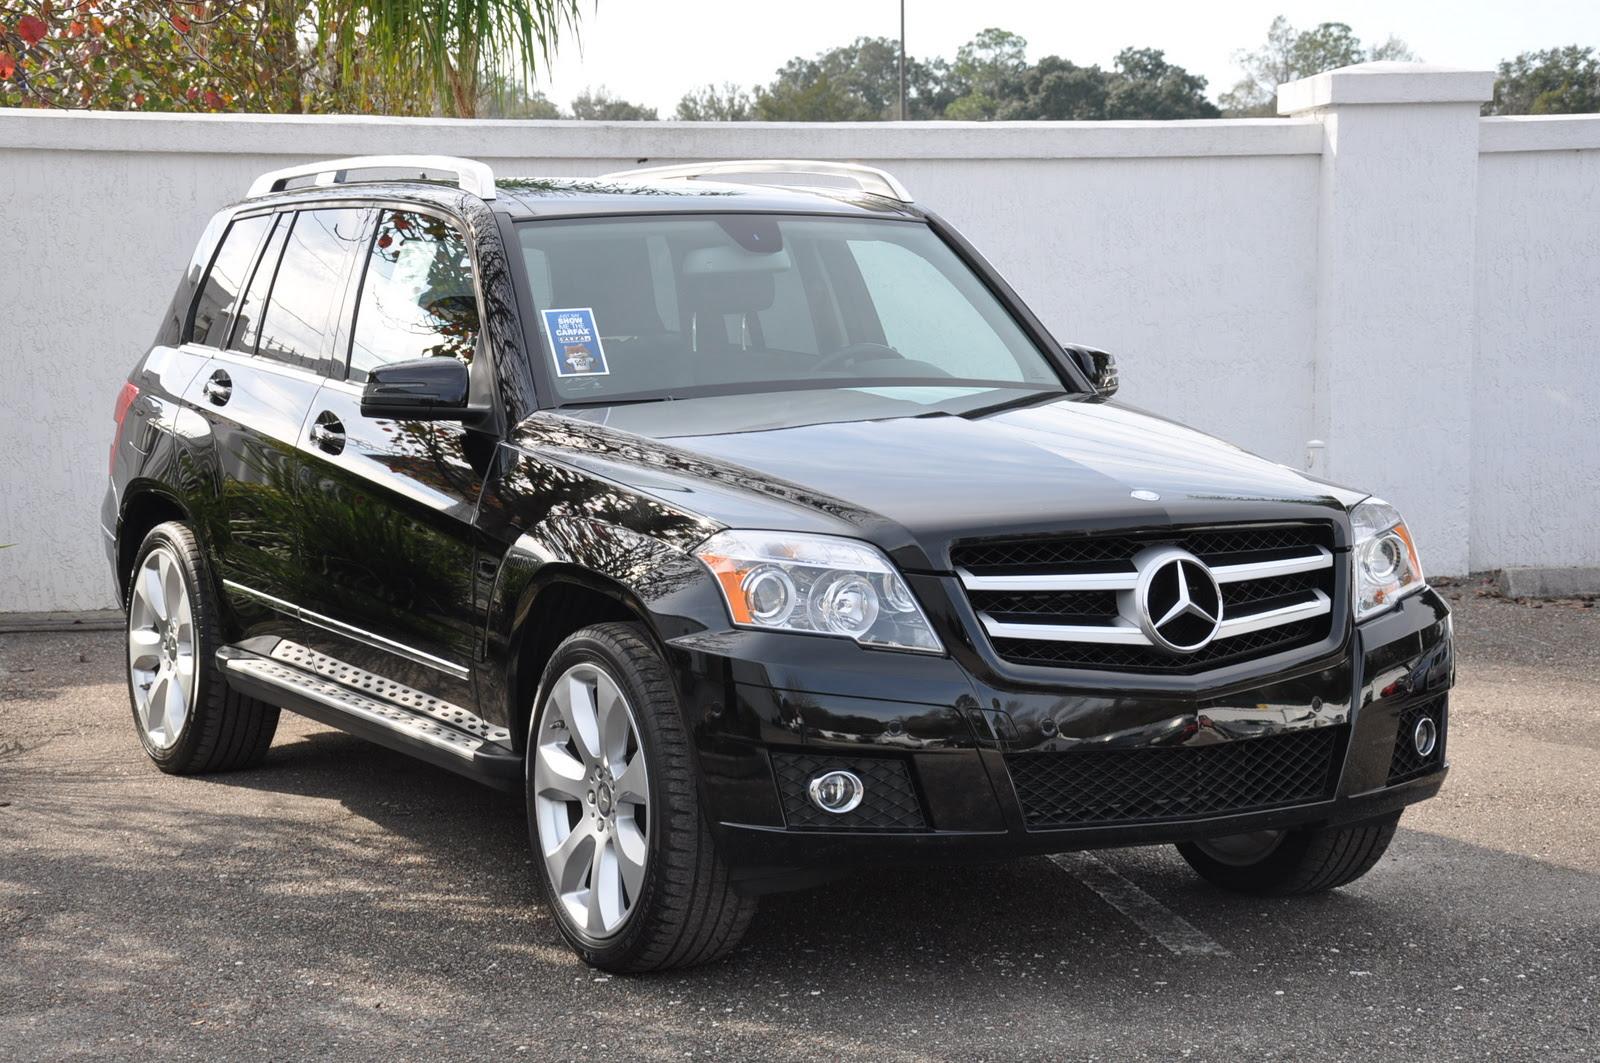 2010 Mercedes-Benz GLK-Class - Pictures - CarGurus